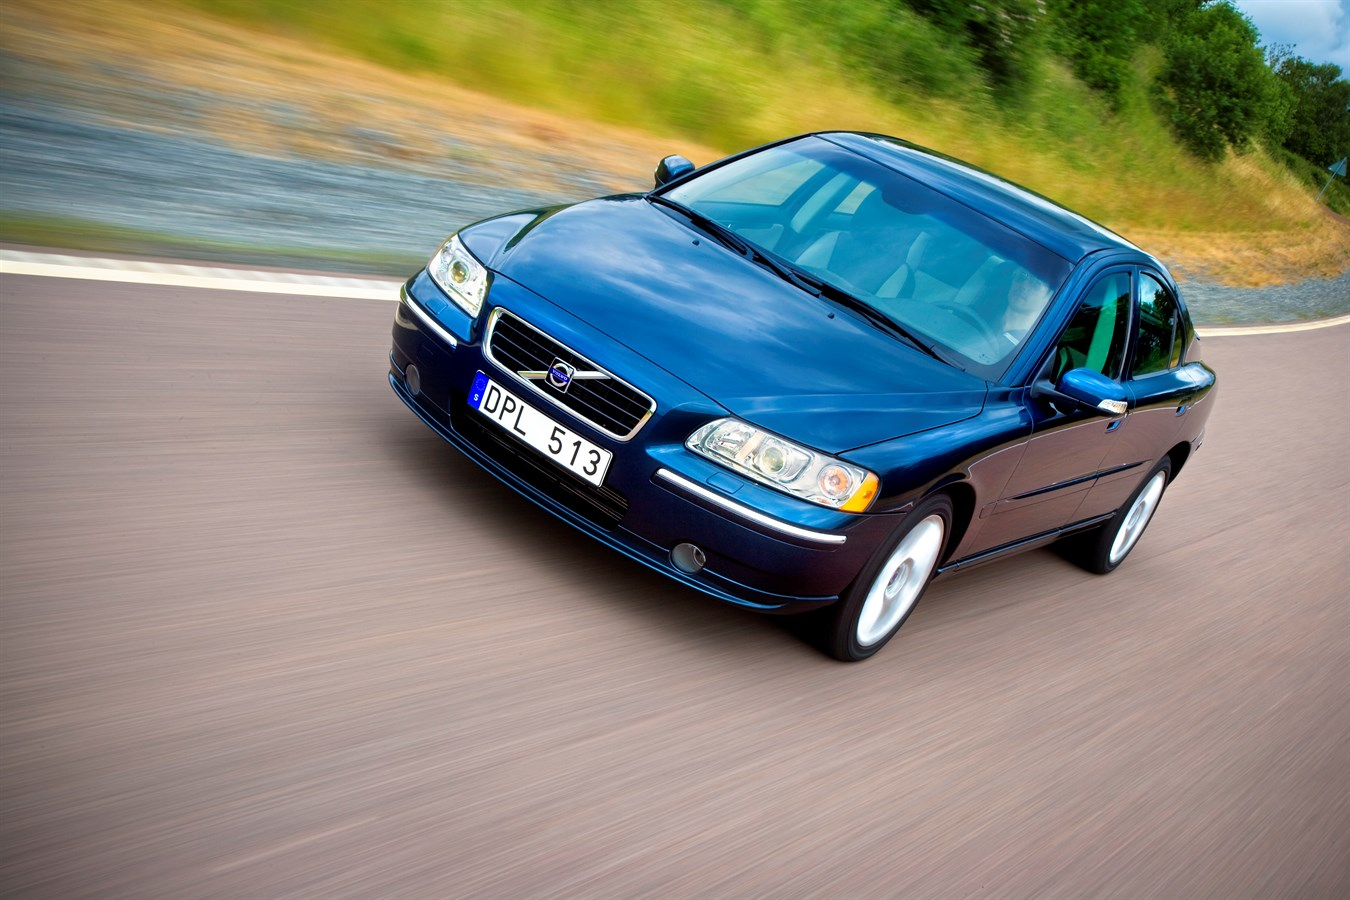 Volvo S60 Model Year 2008 Volvo Cars Global Media Newsroom